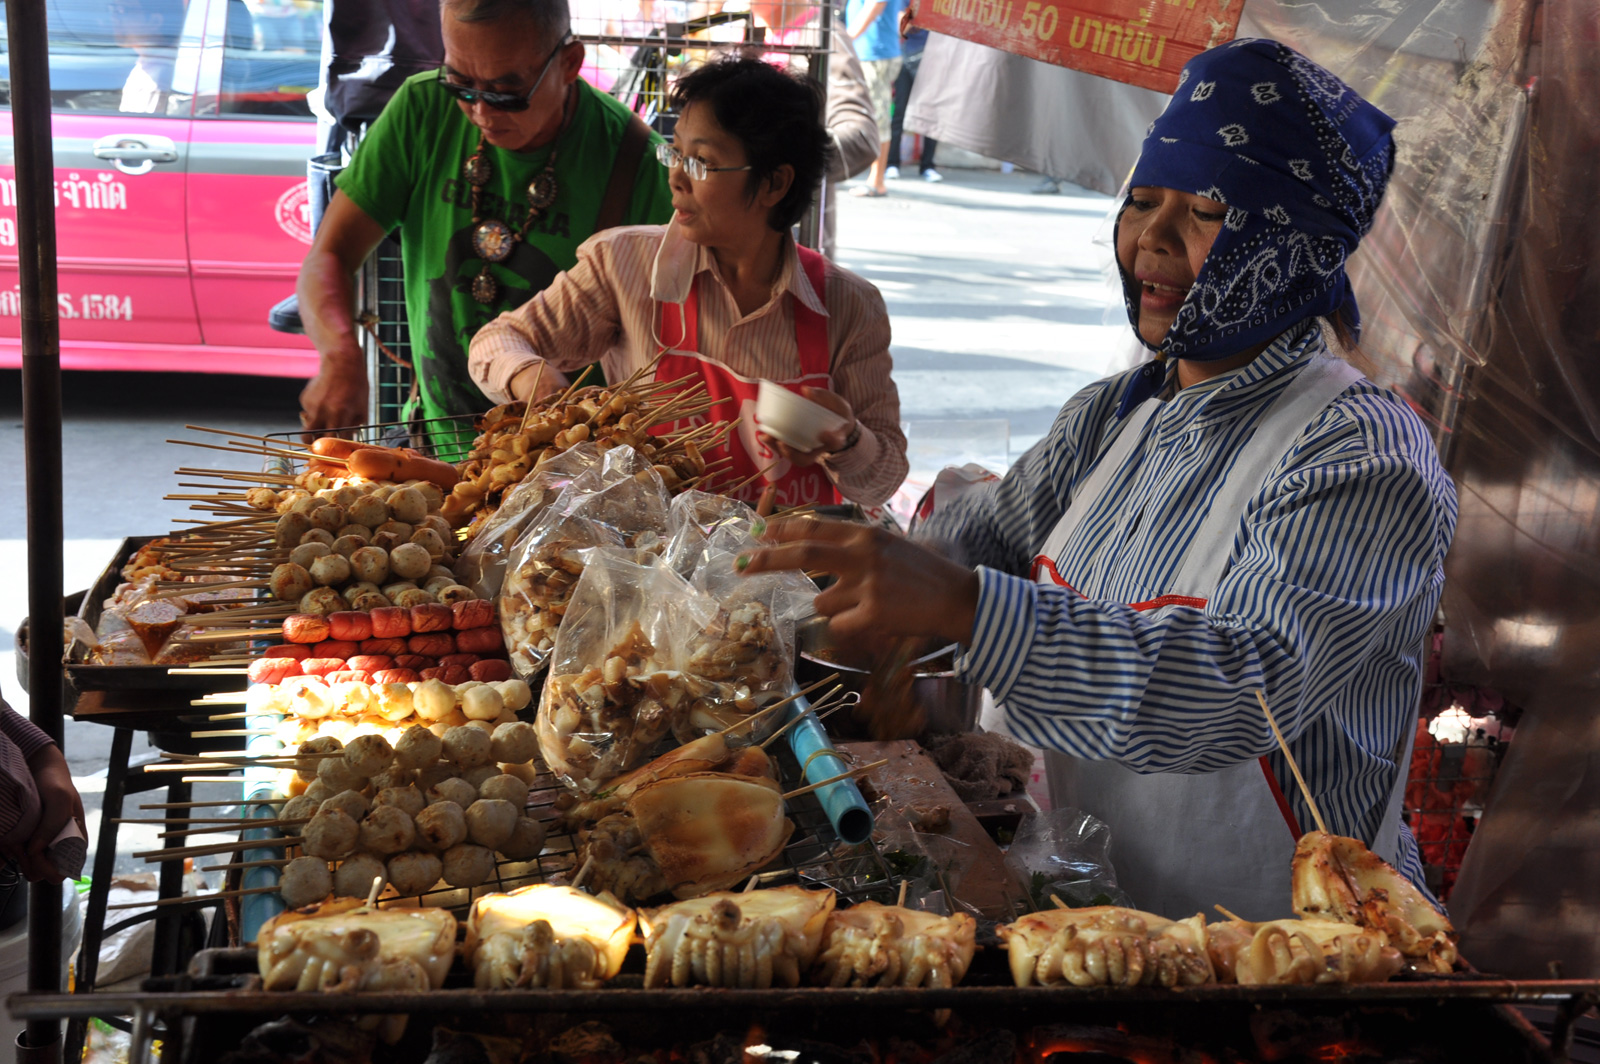 voyage-culinaire-gastronomie-plats-typiques-Thailande-OliverTrips-4